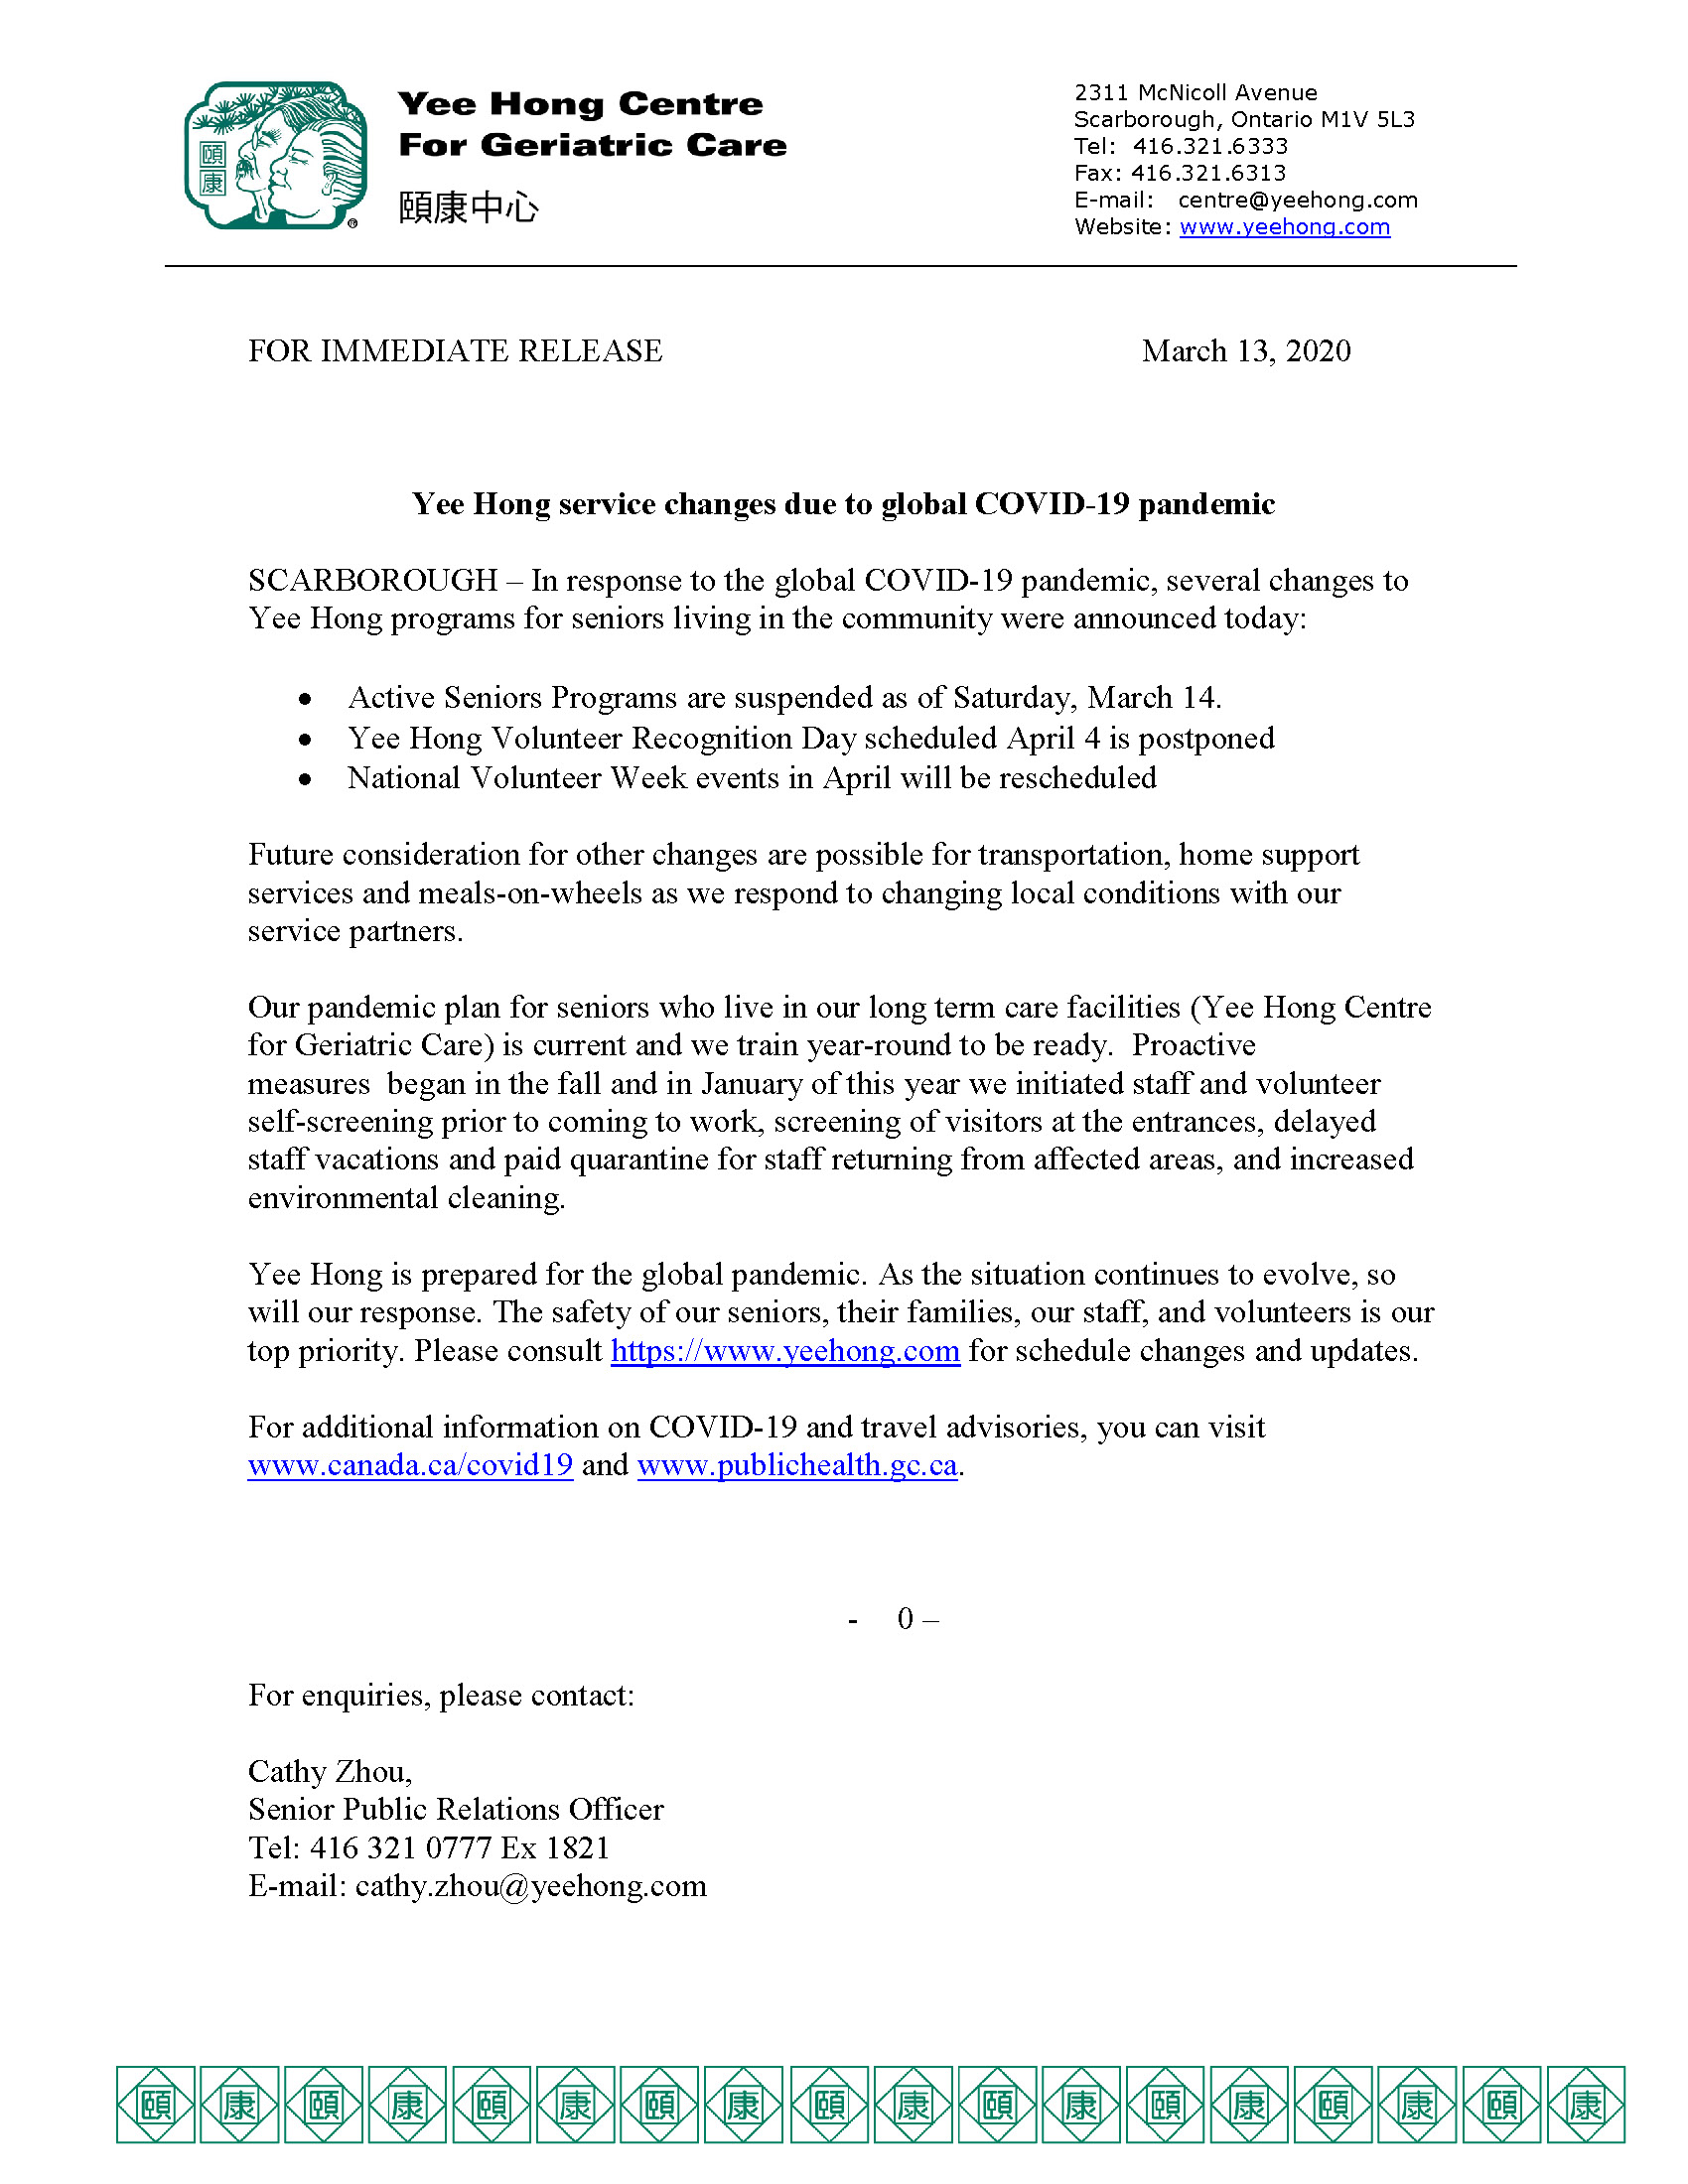 News Release Mar 13, 2020